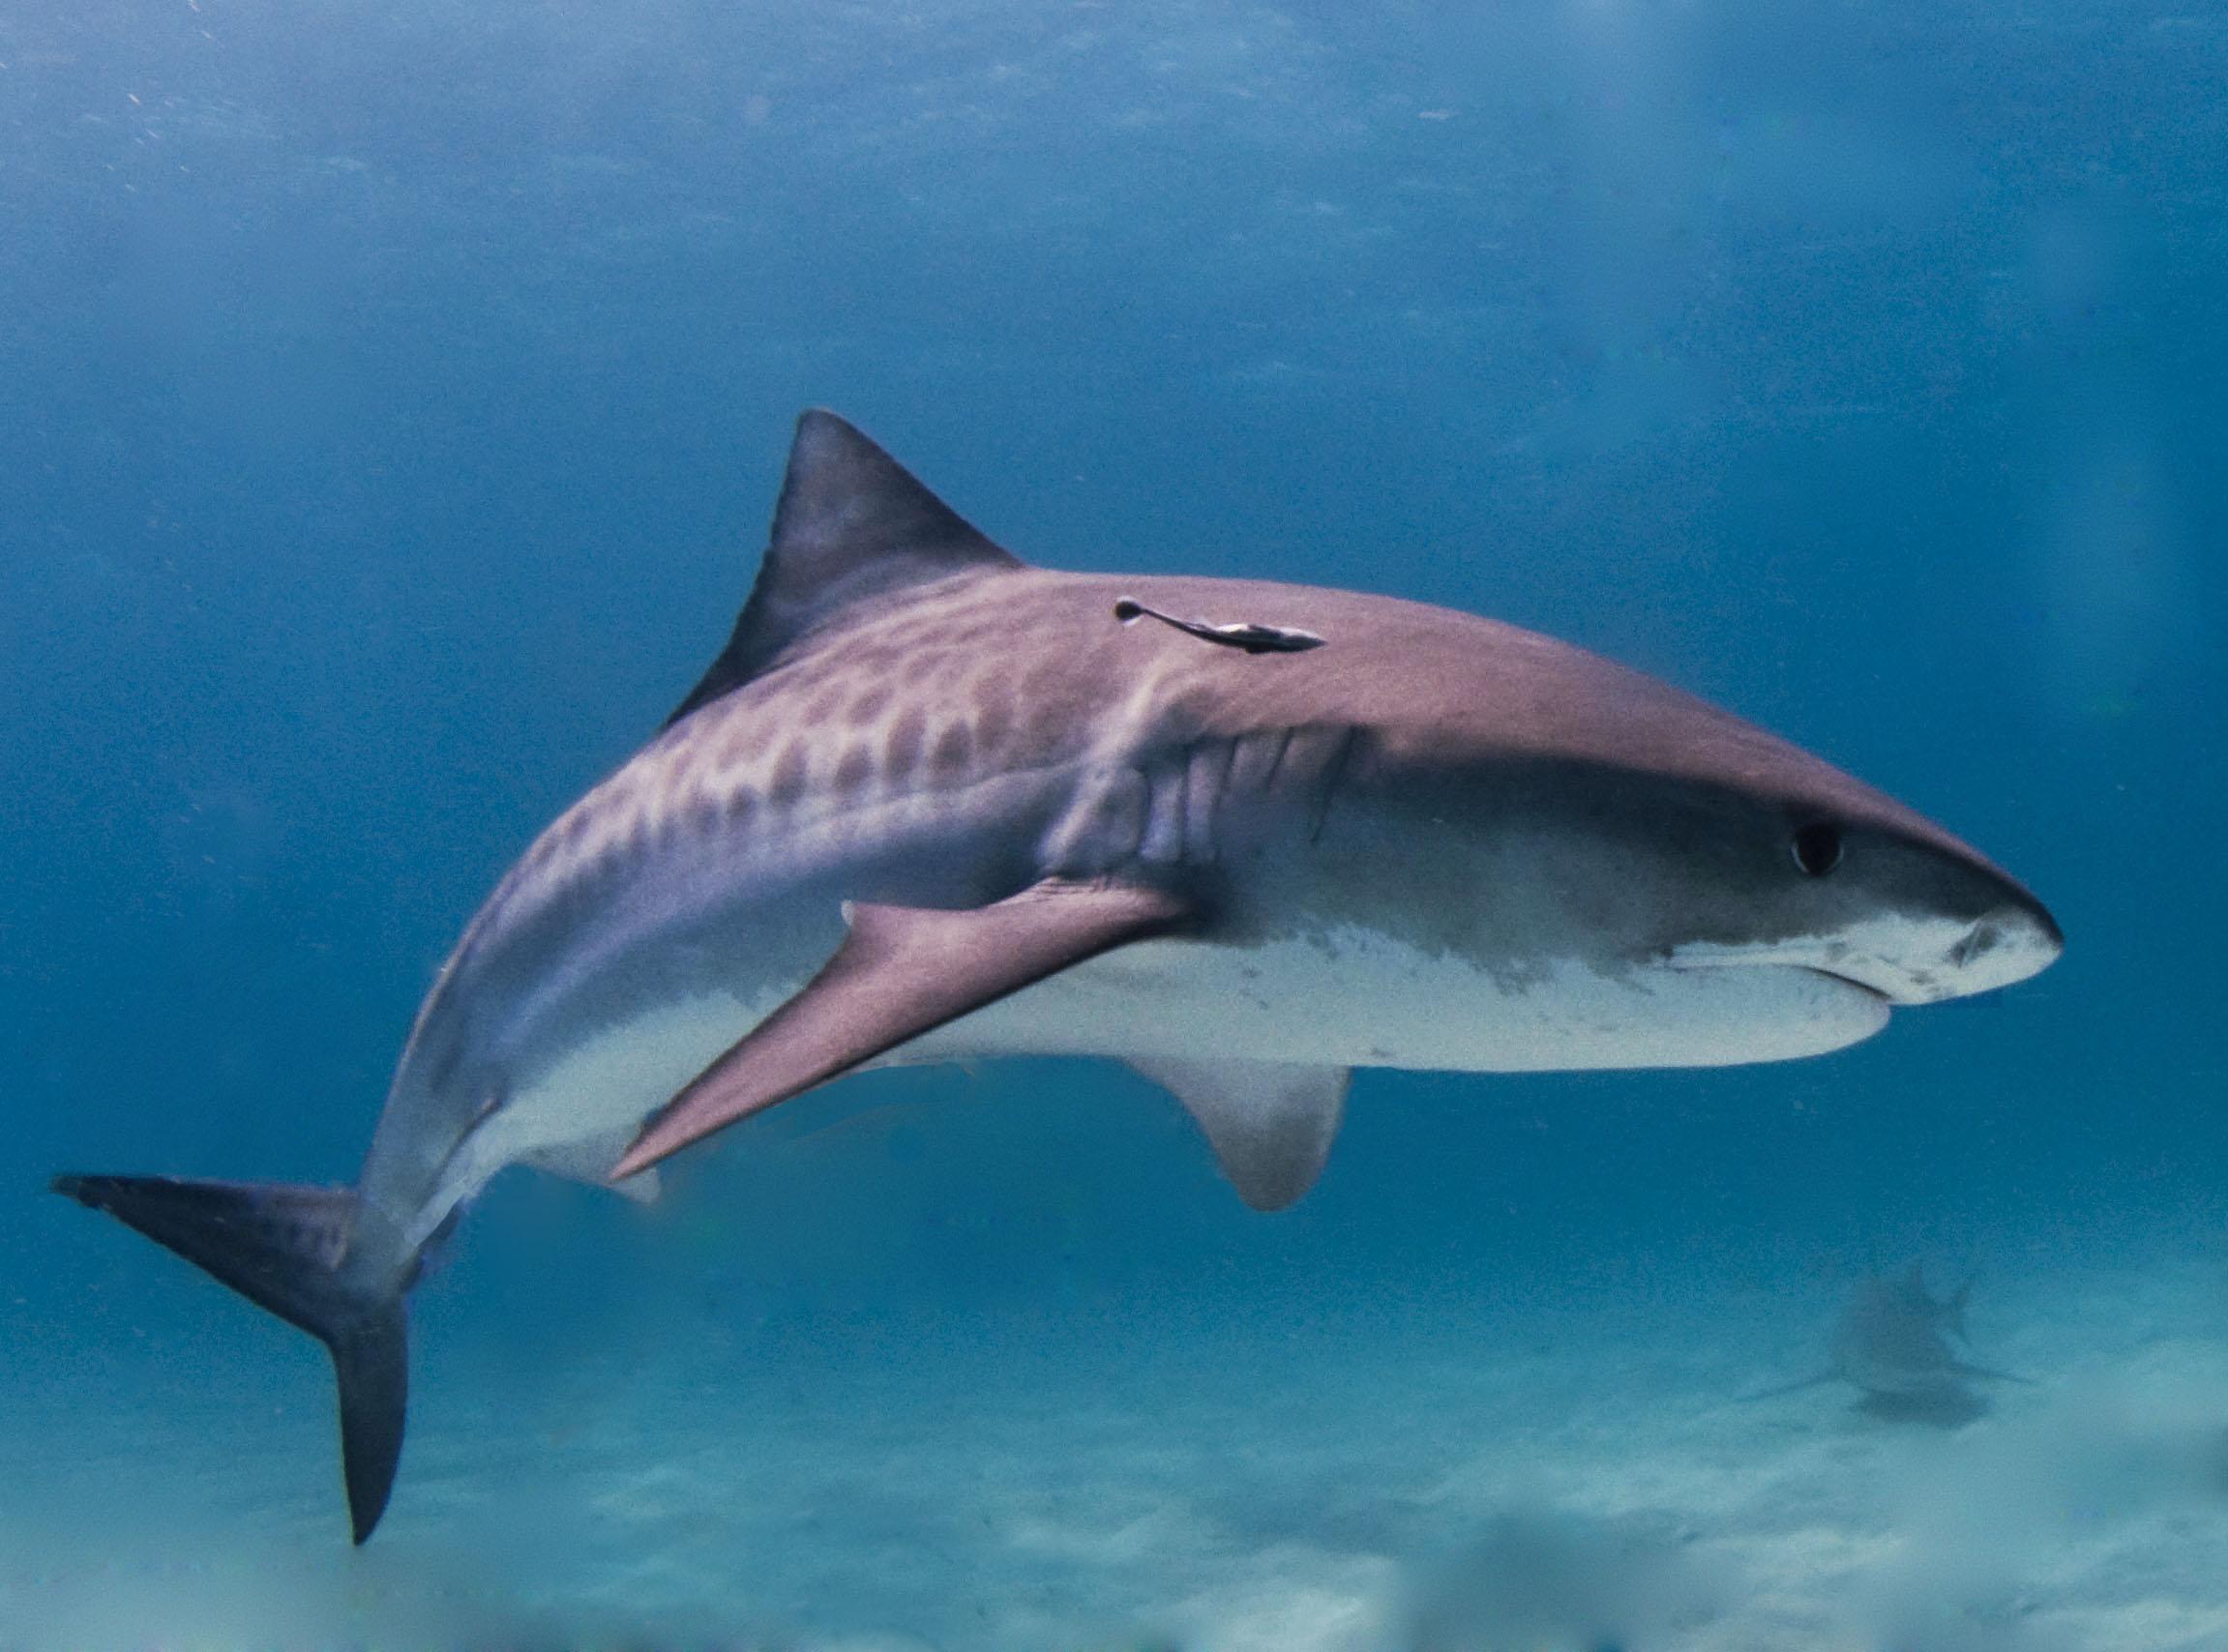 Tiger shark side view wallpaper